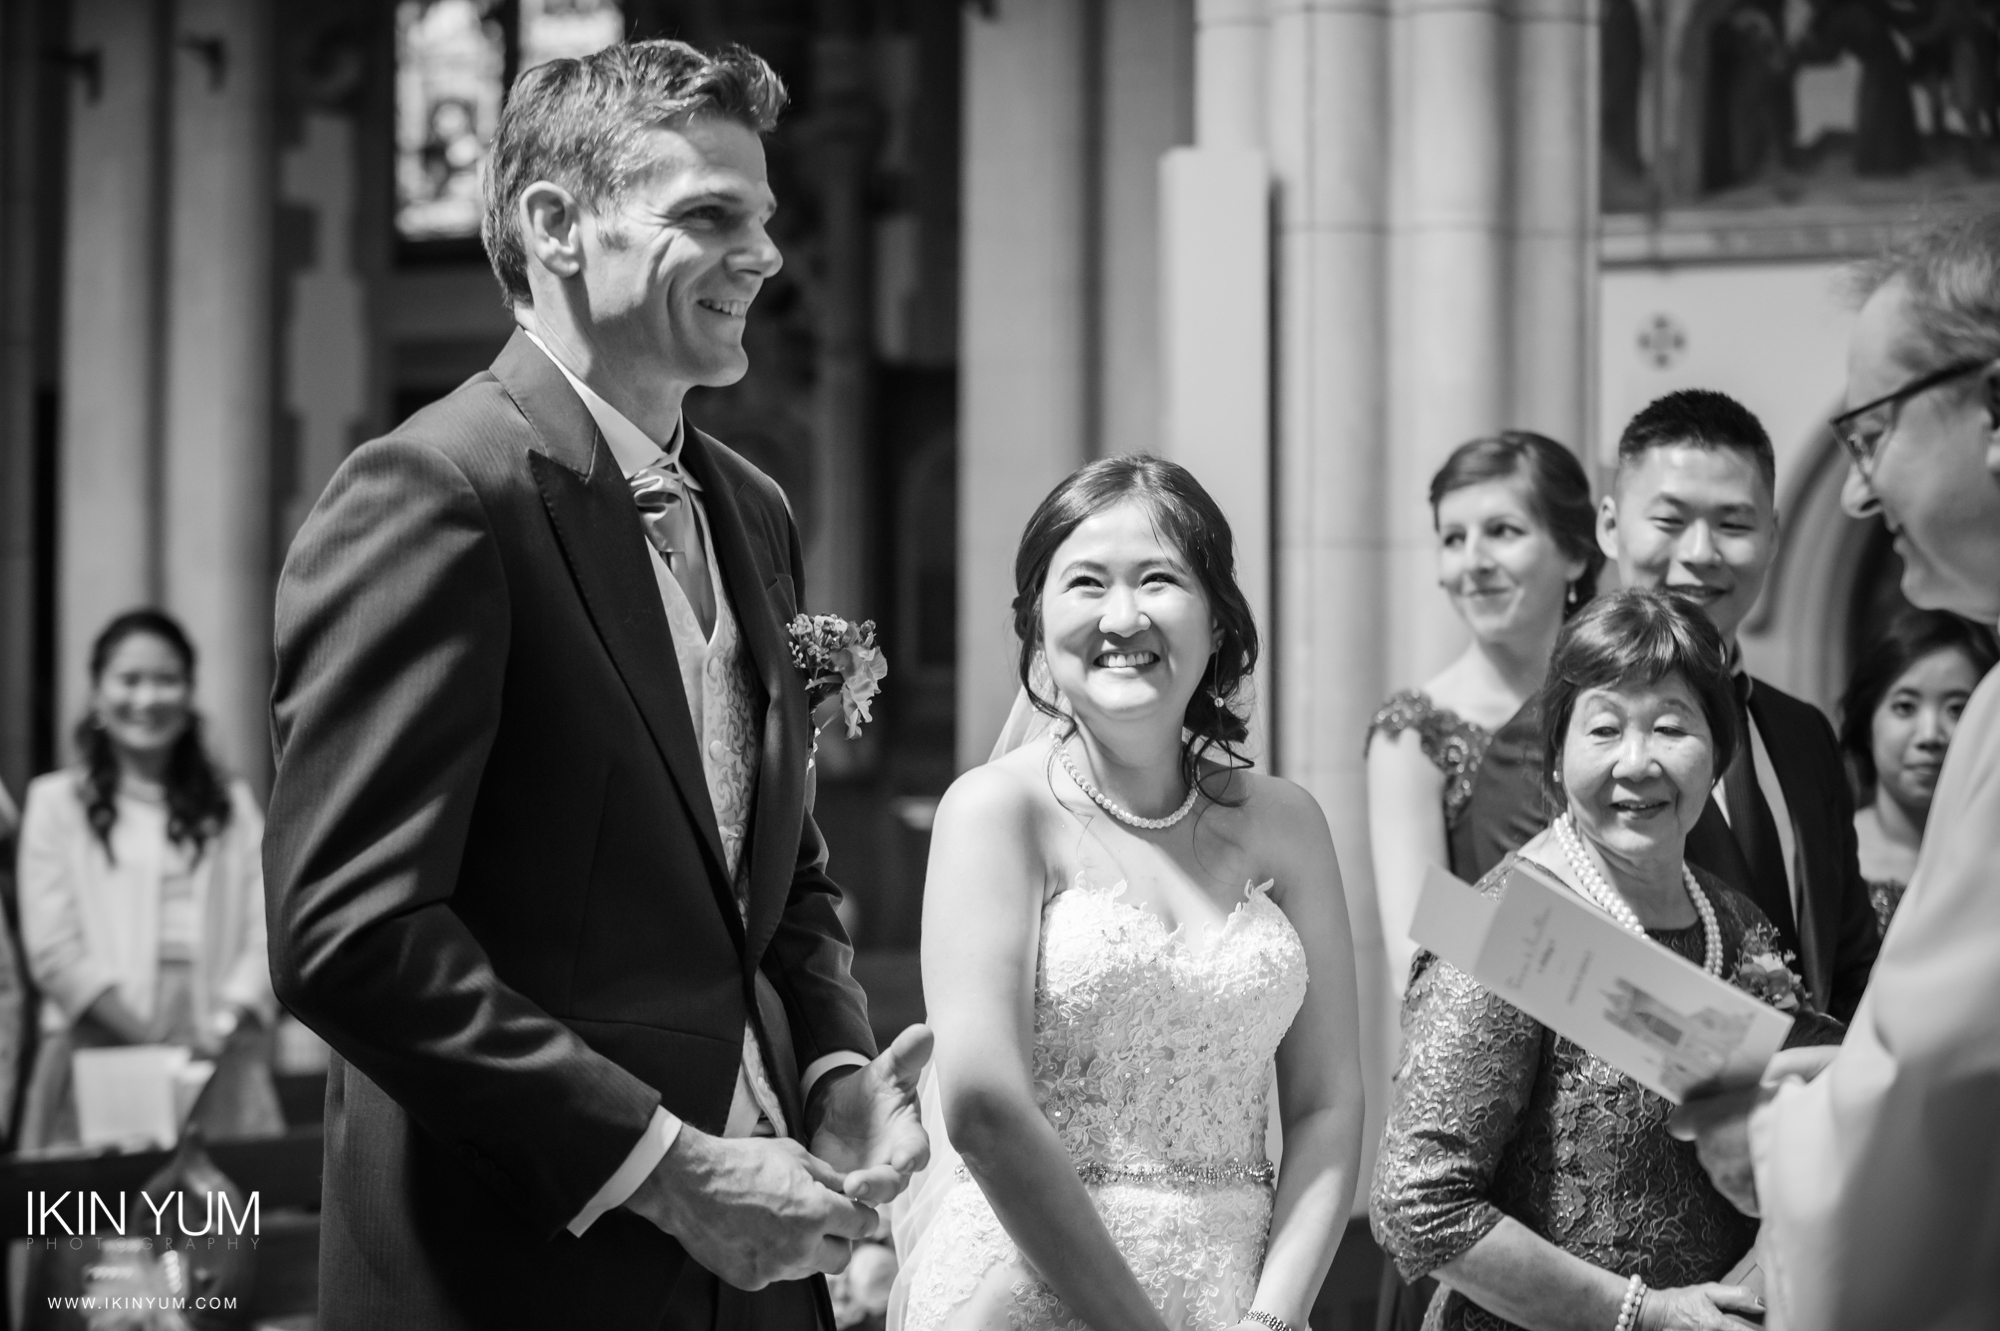 Teresa & Johnathan Weddong Day - The Ceremony-0095.jpg